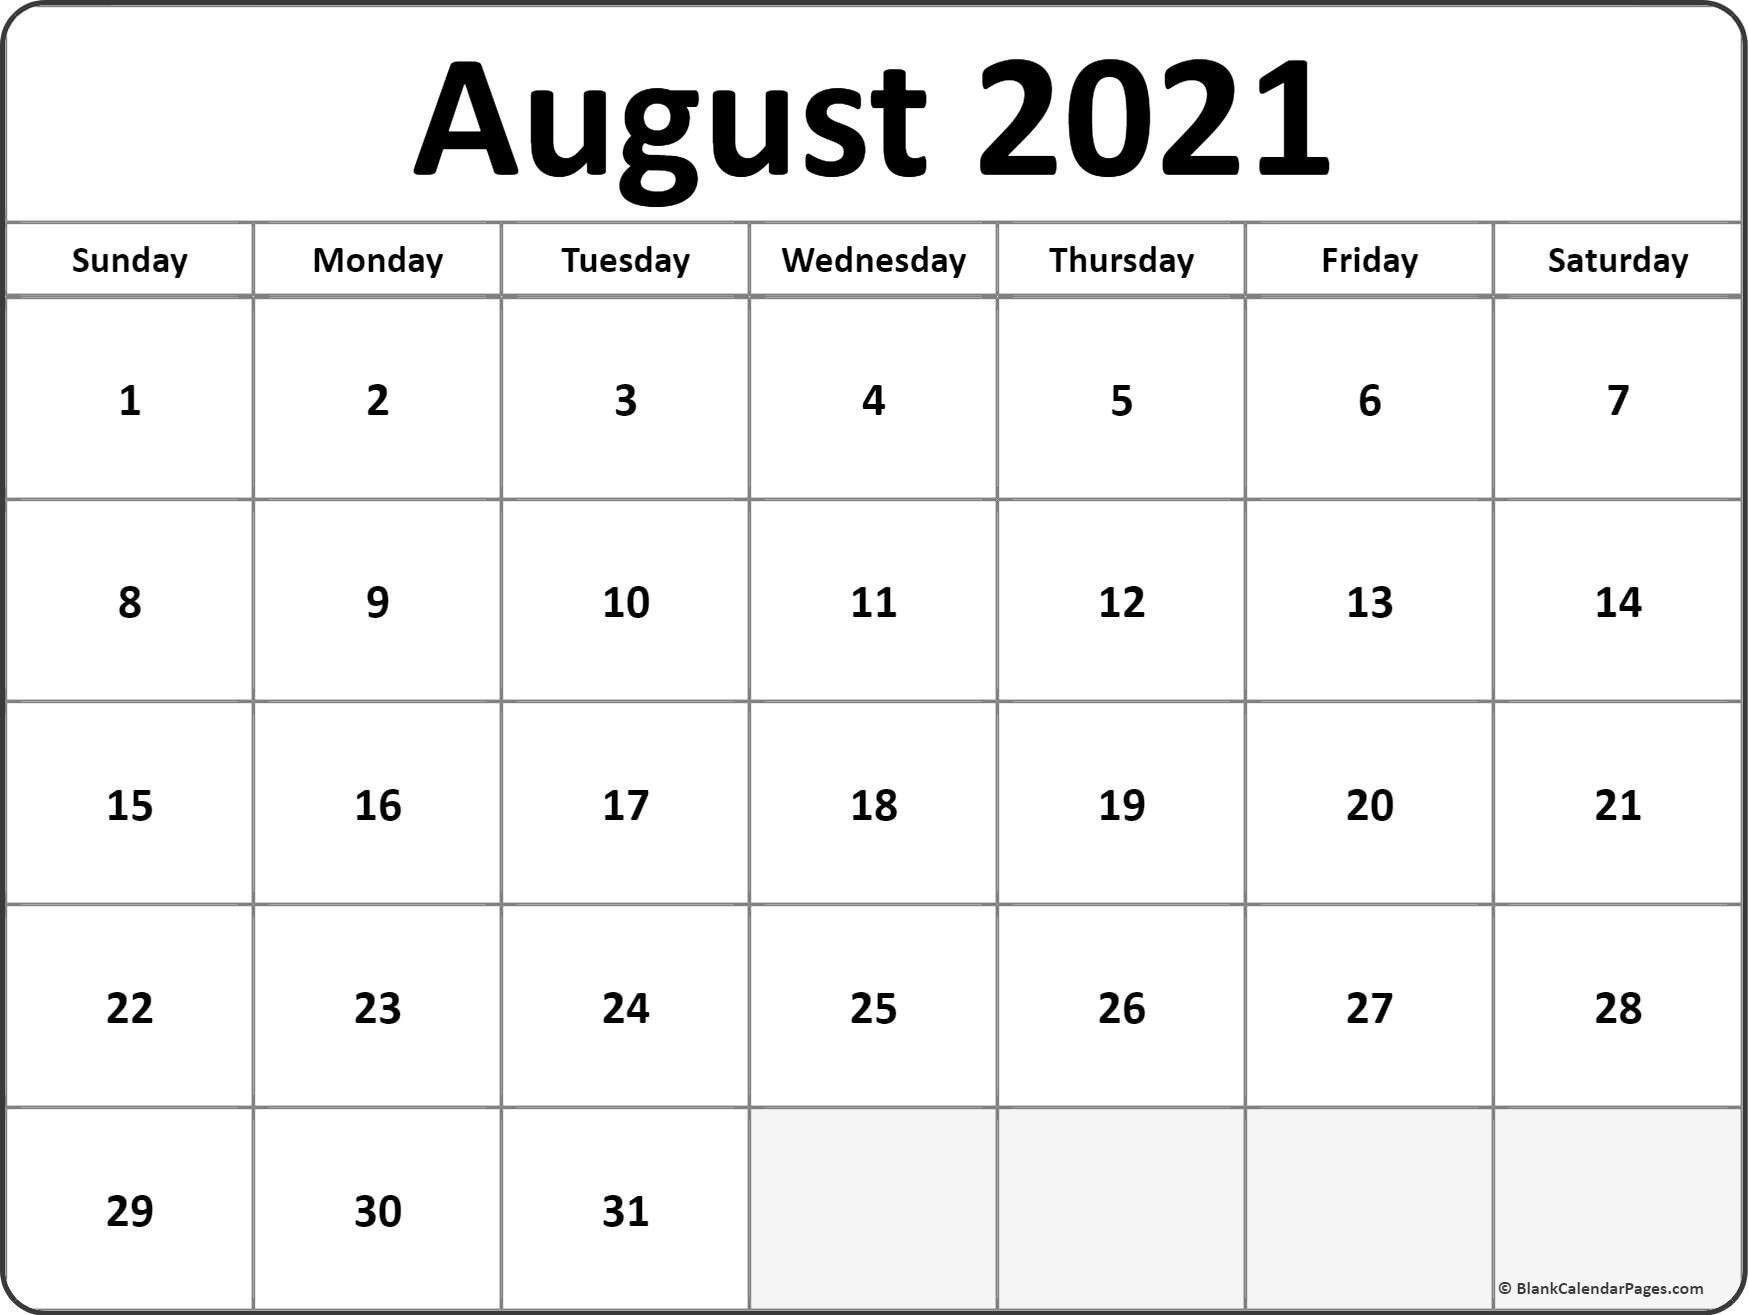 June July Aug 2021 Printable Calanders | Calendar within August 2021 Template Calendar